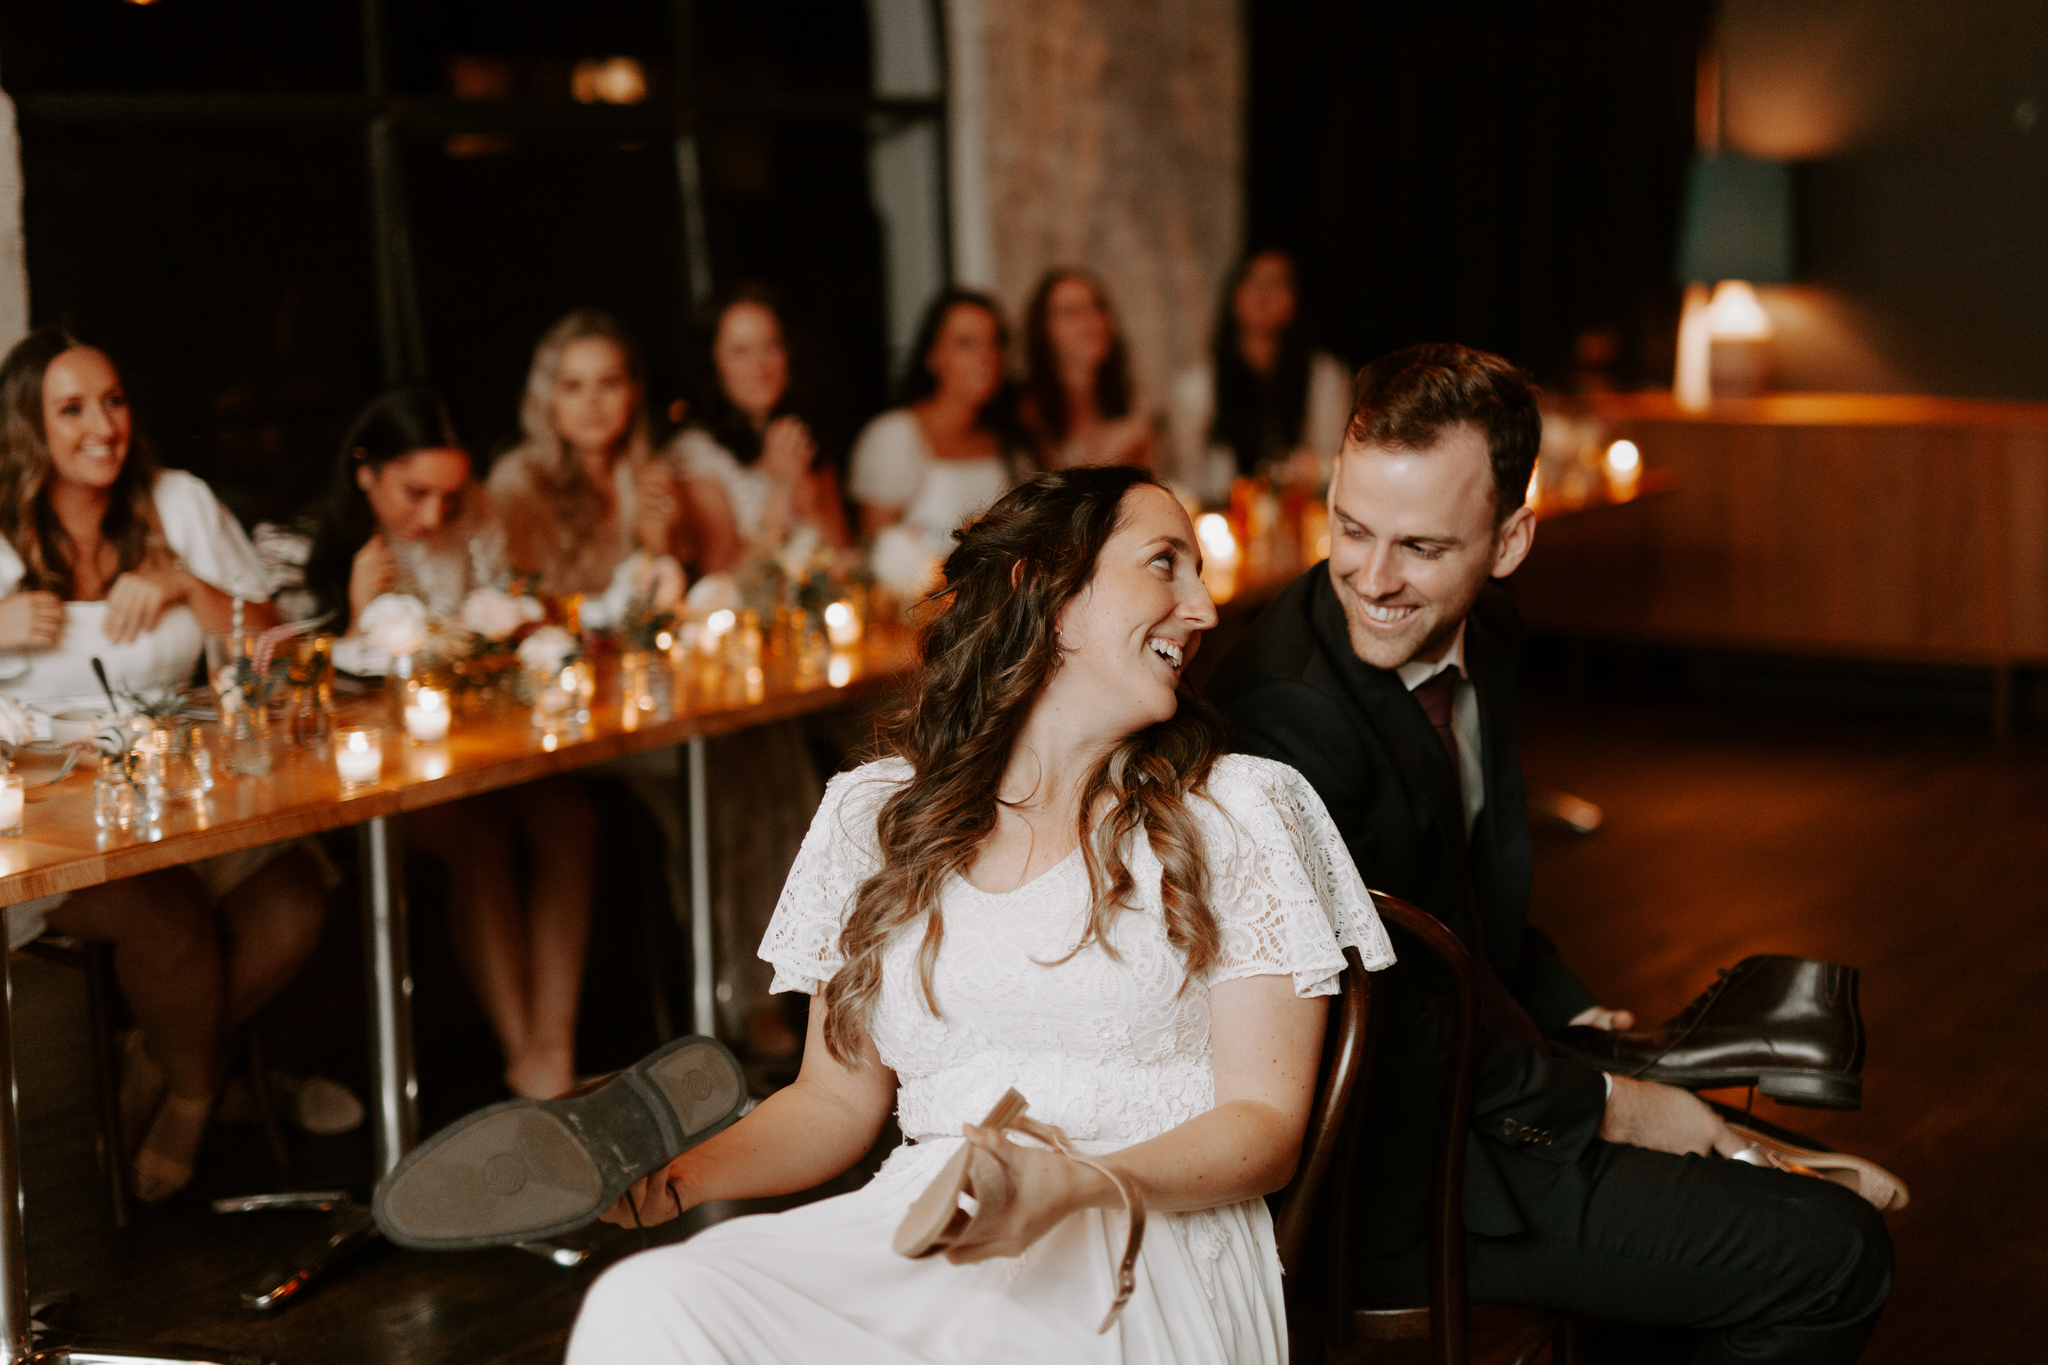 Panama-Dining-Room-wedding-emotionsandmath-054.jpg